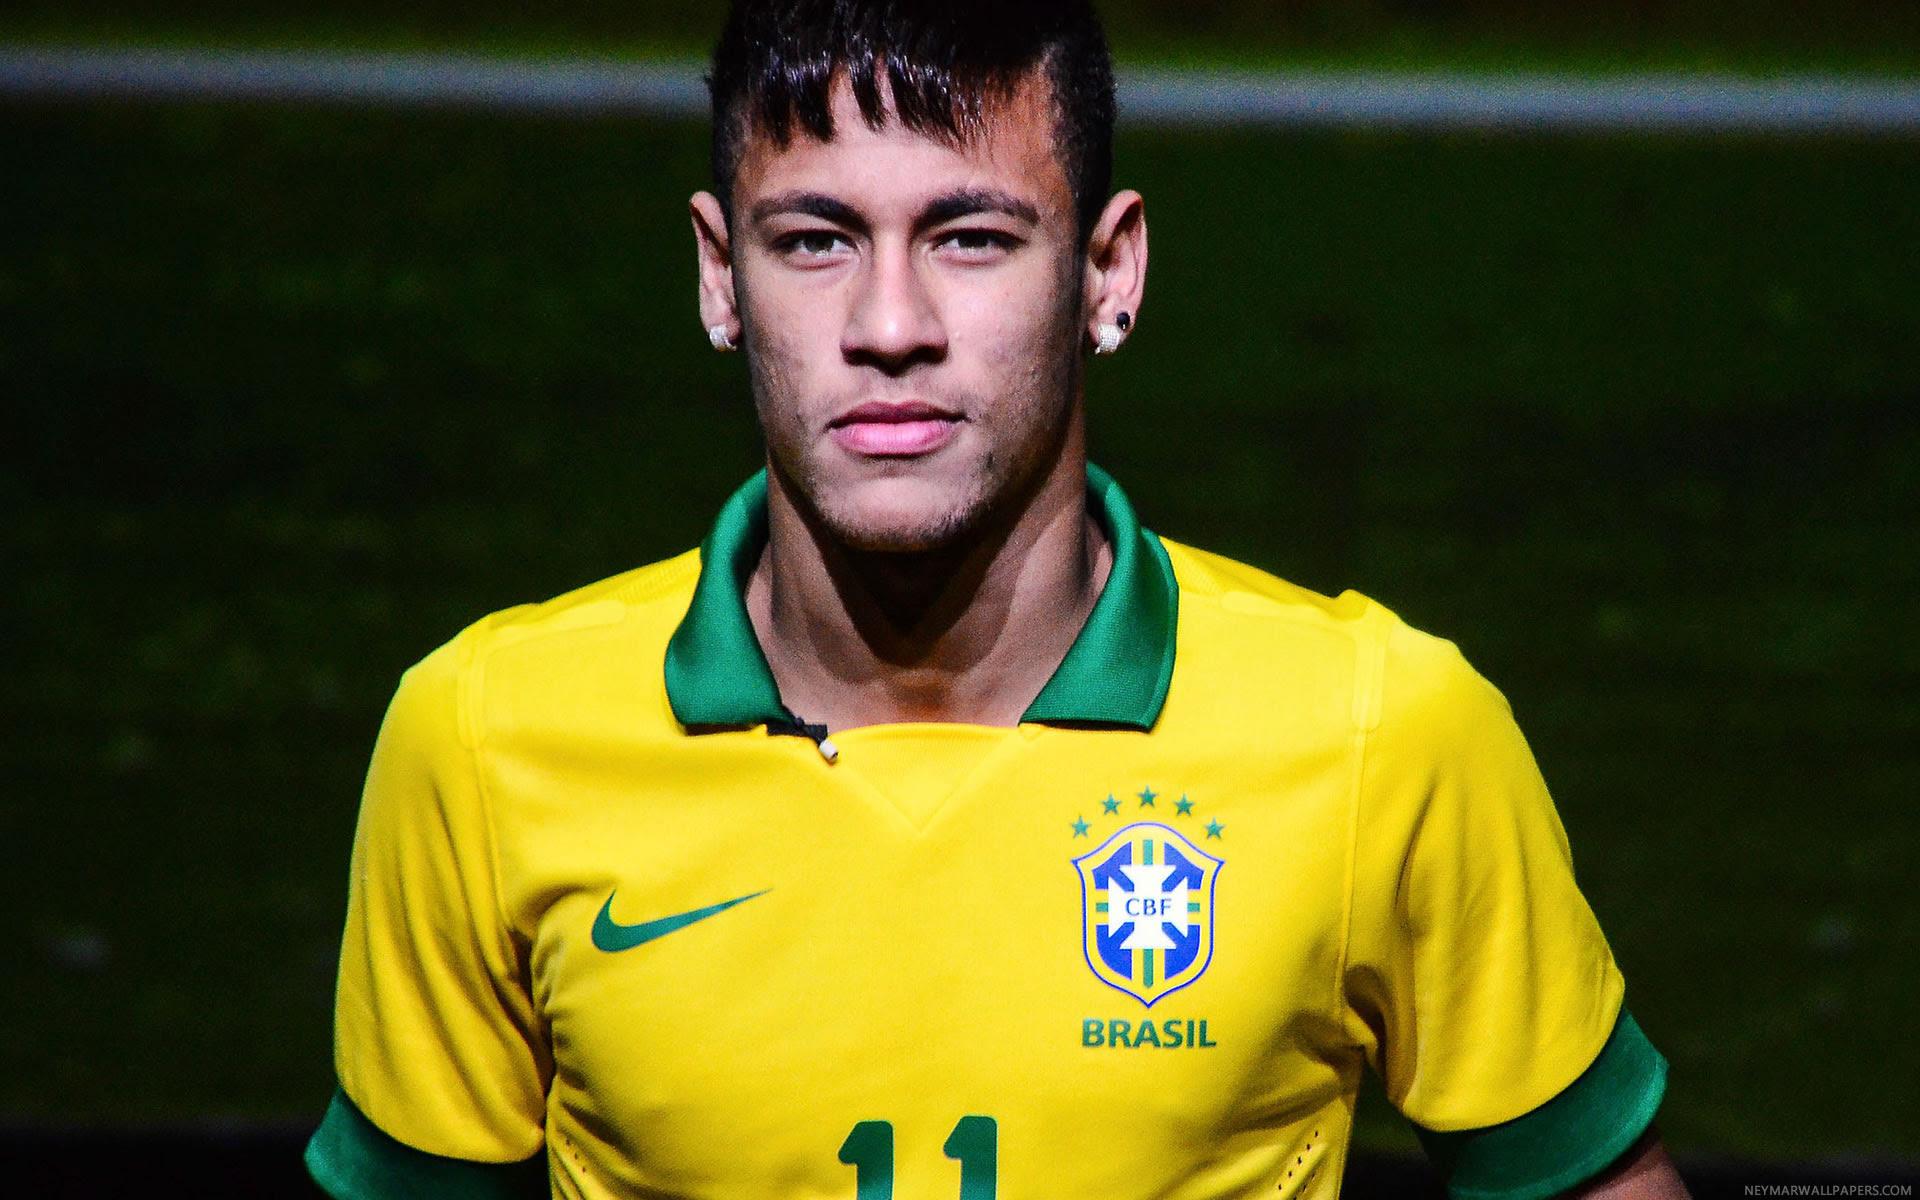 Neymar Brazil - Neymar Wallpapers